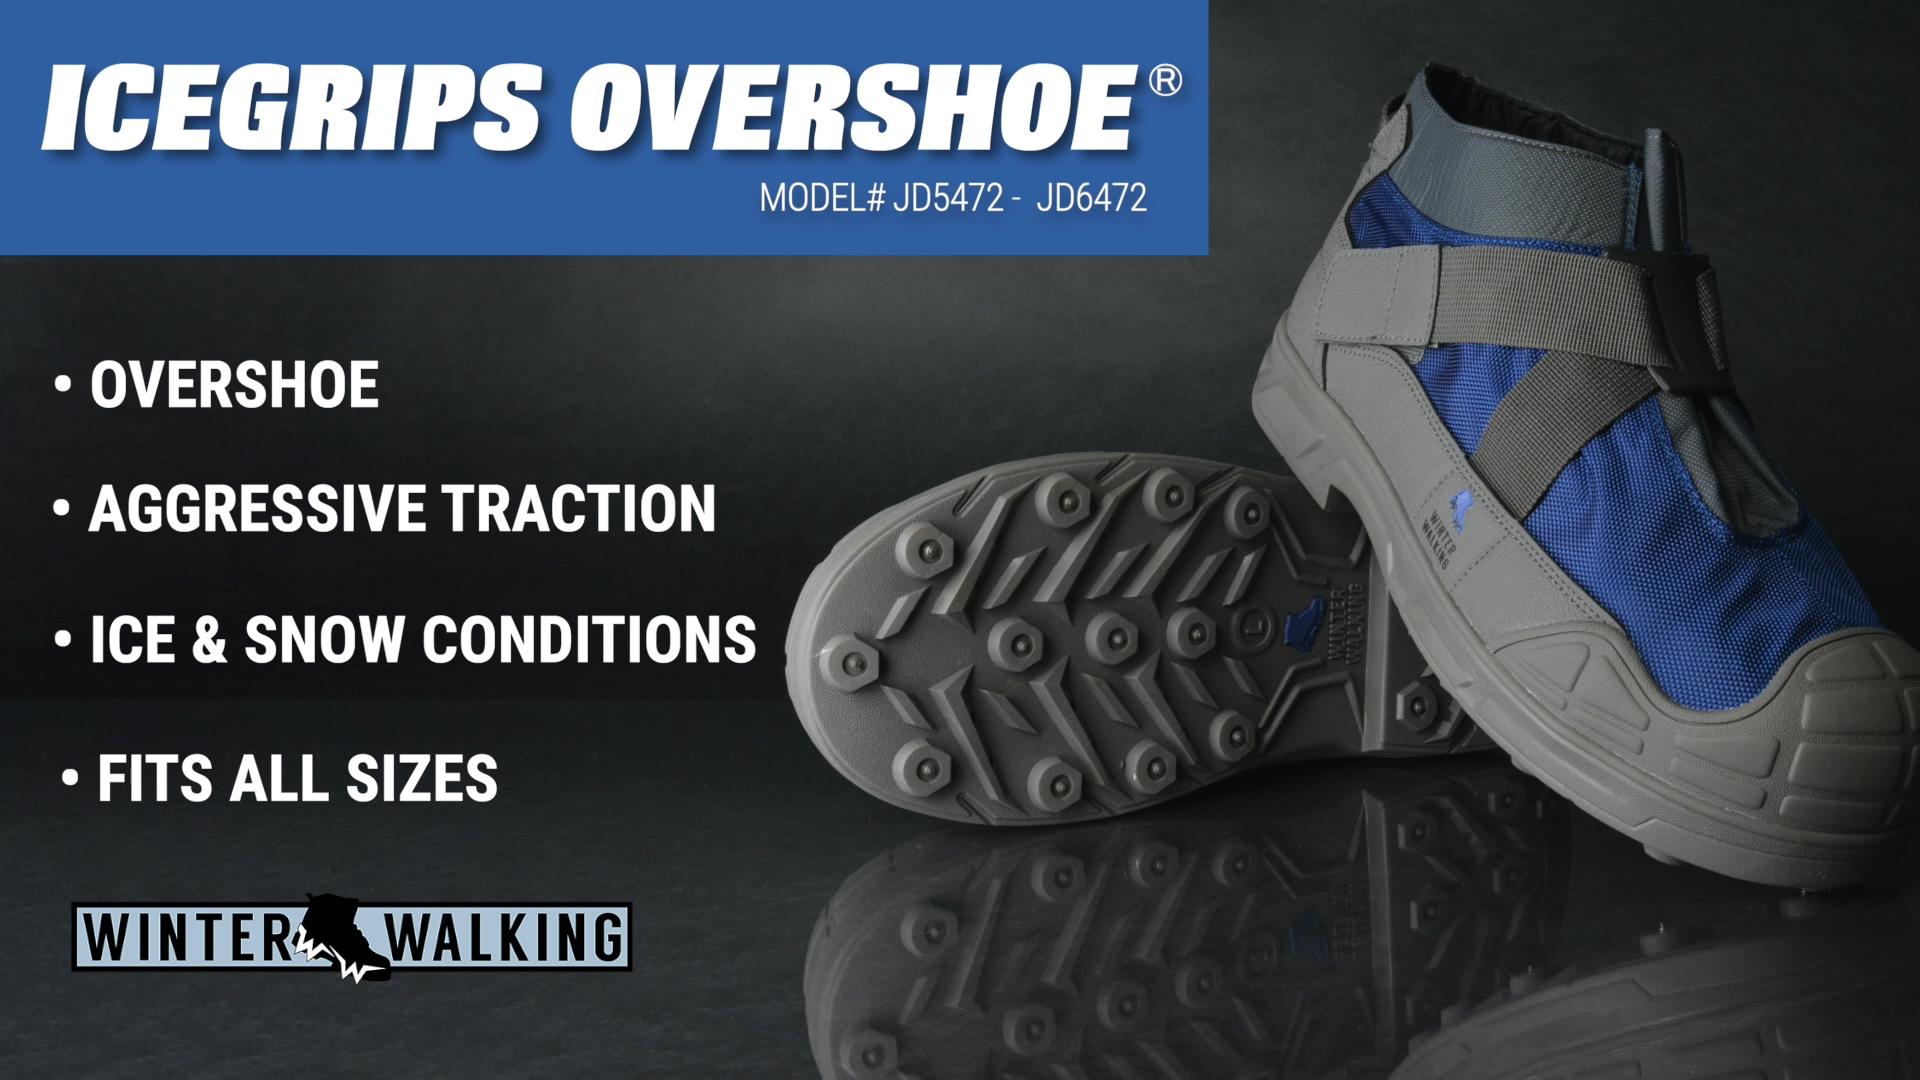 IceGrips Overshoes - Training